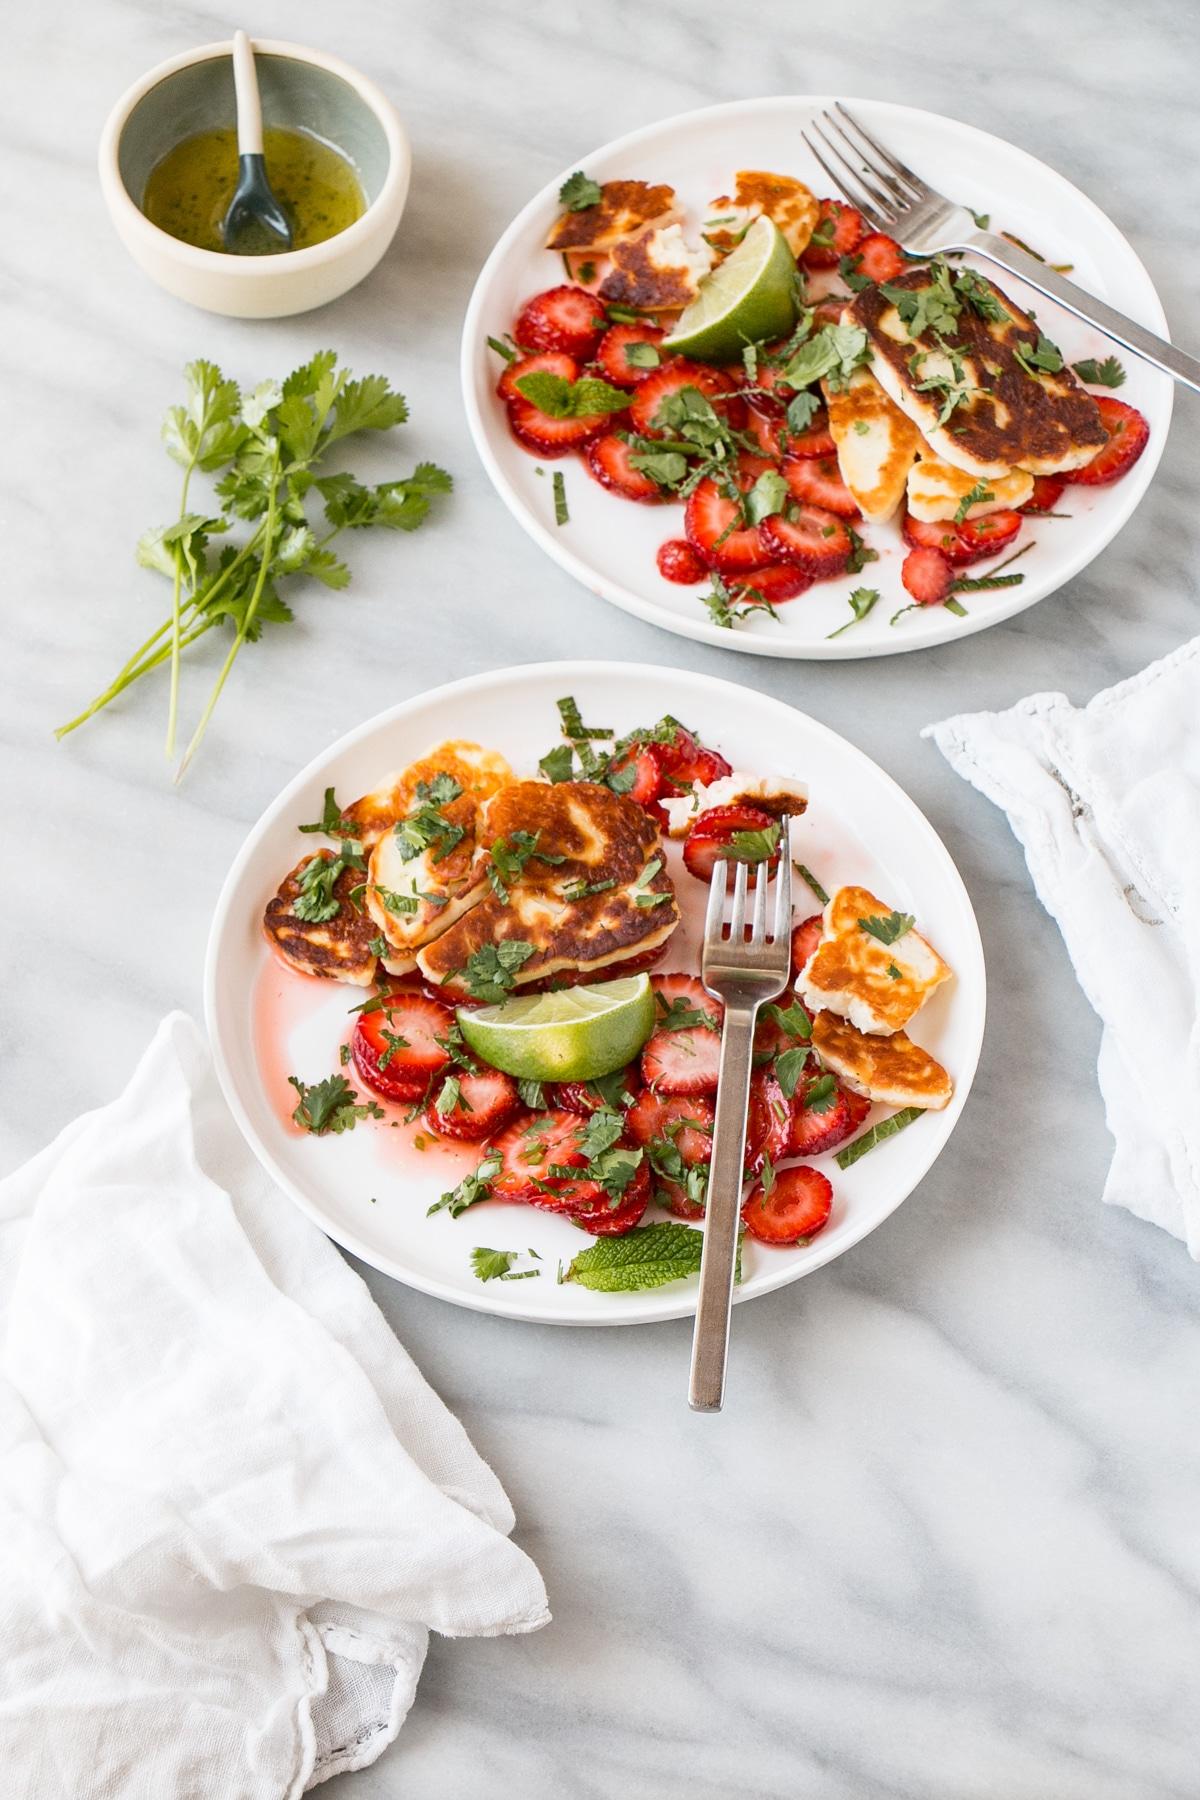 Halloumi and Strawberry Salad on white plates.